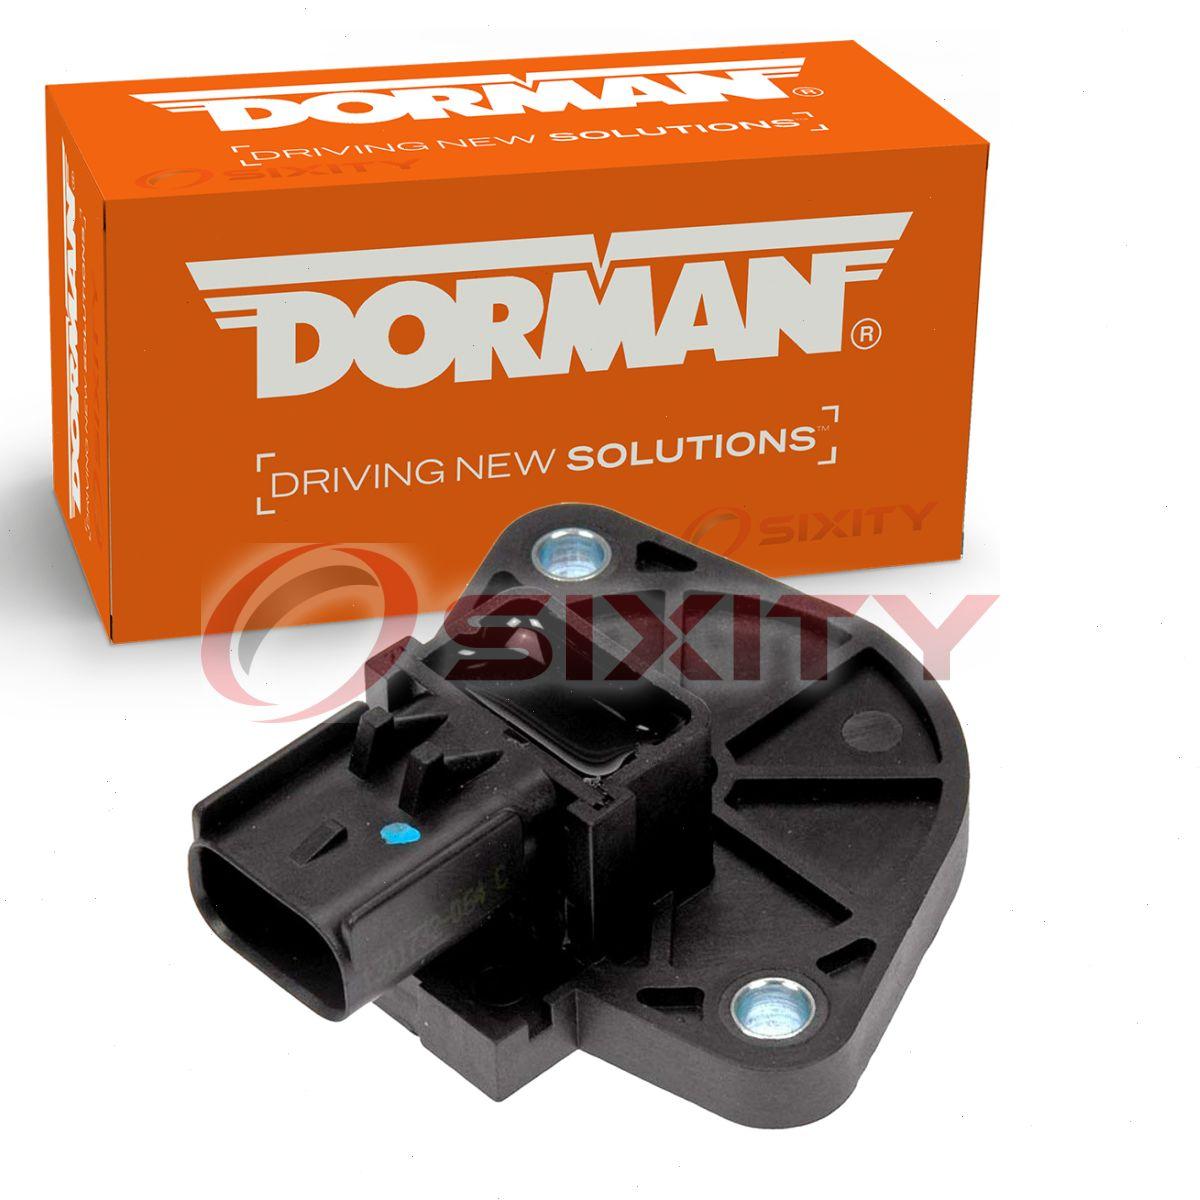 jt Dorman Camshaft Position Sensor for Chrysler PT Cruiser 2001-2010 2.4L L4